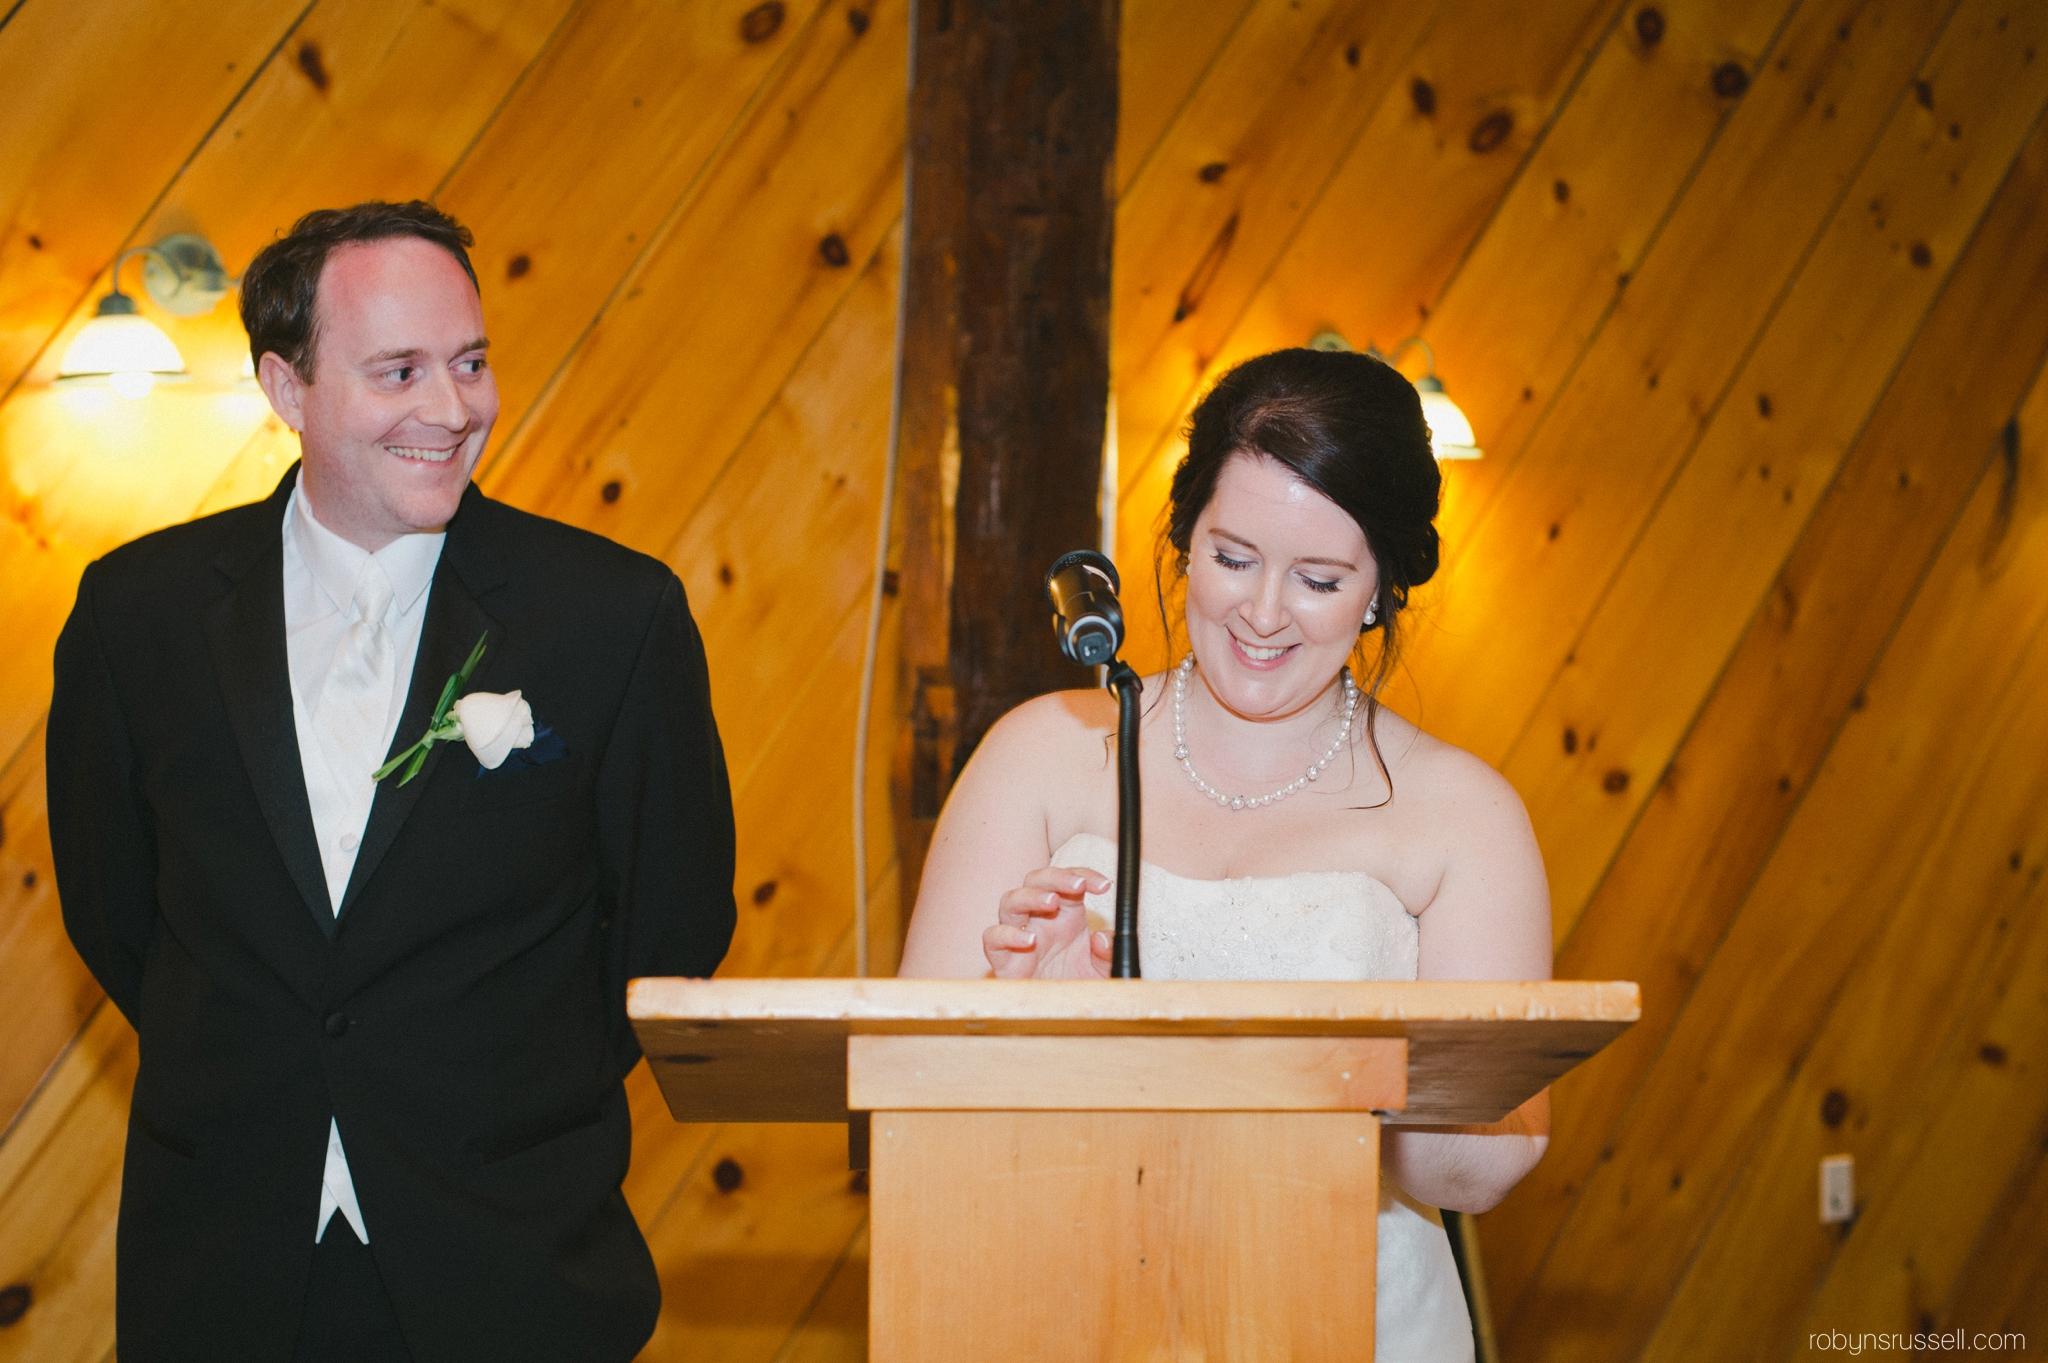 46-bride-and-groom-speech.jpg